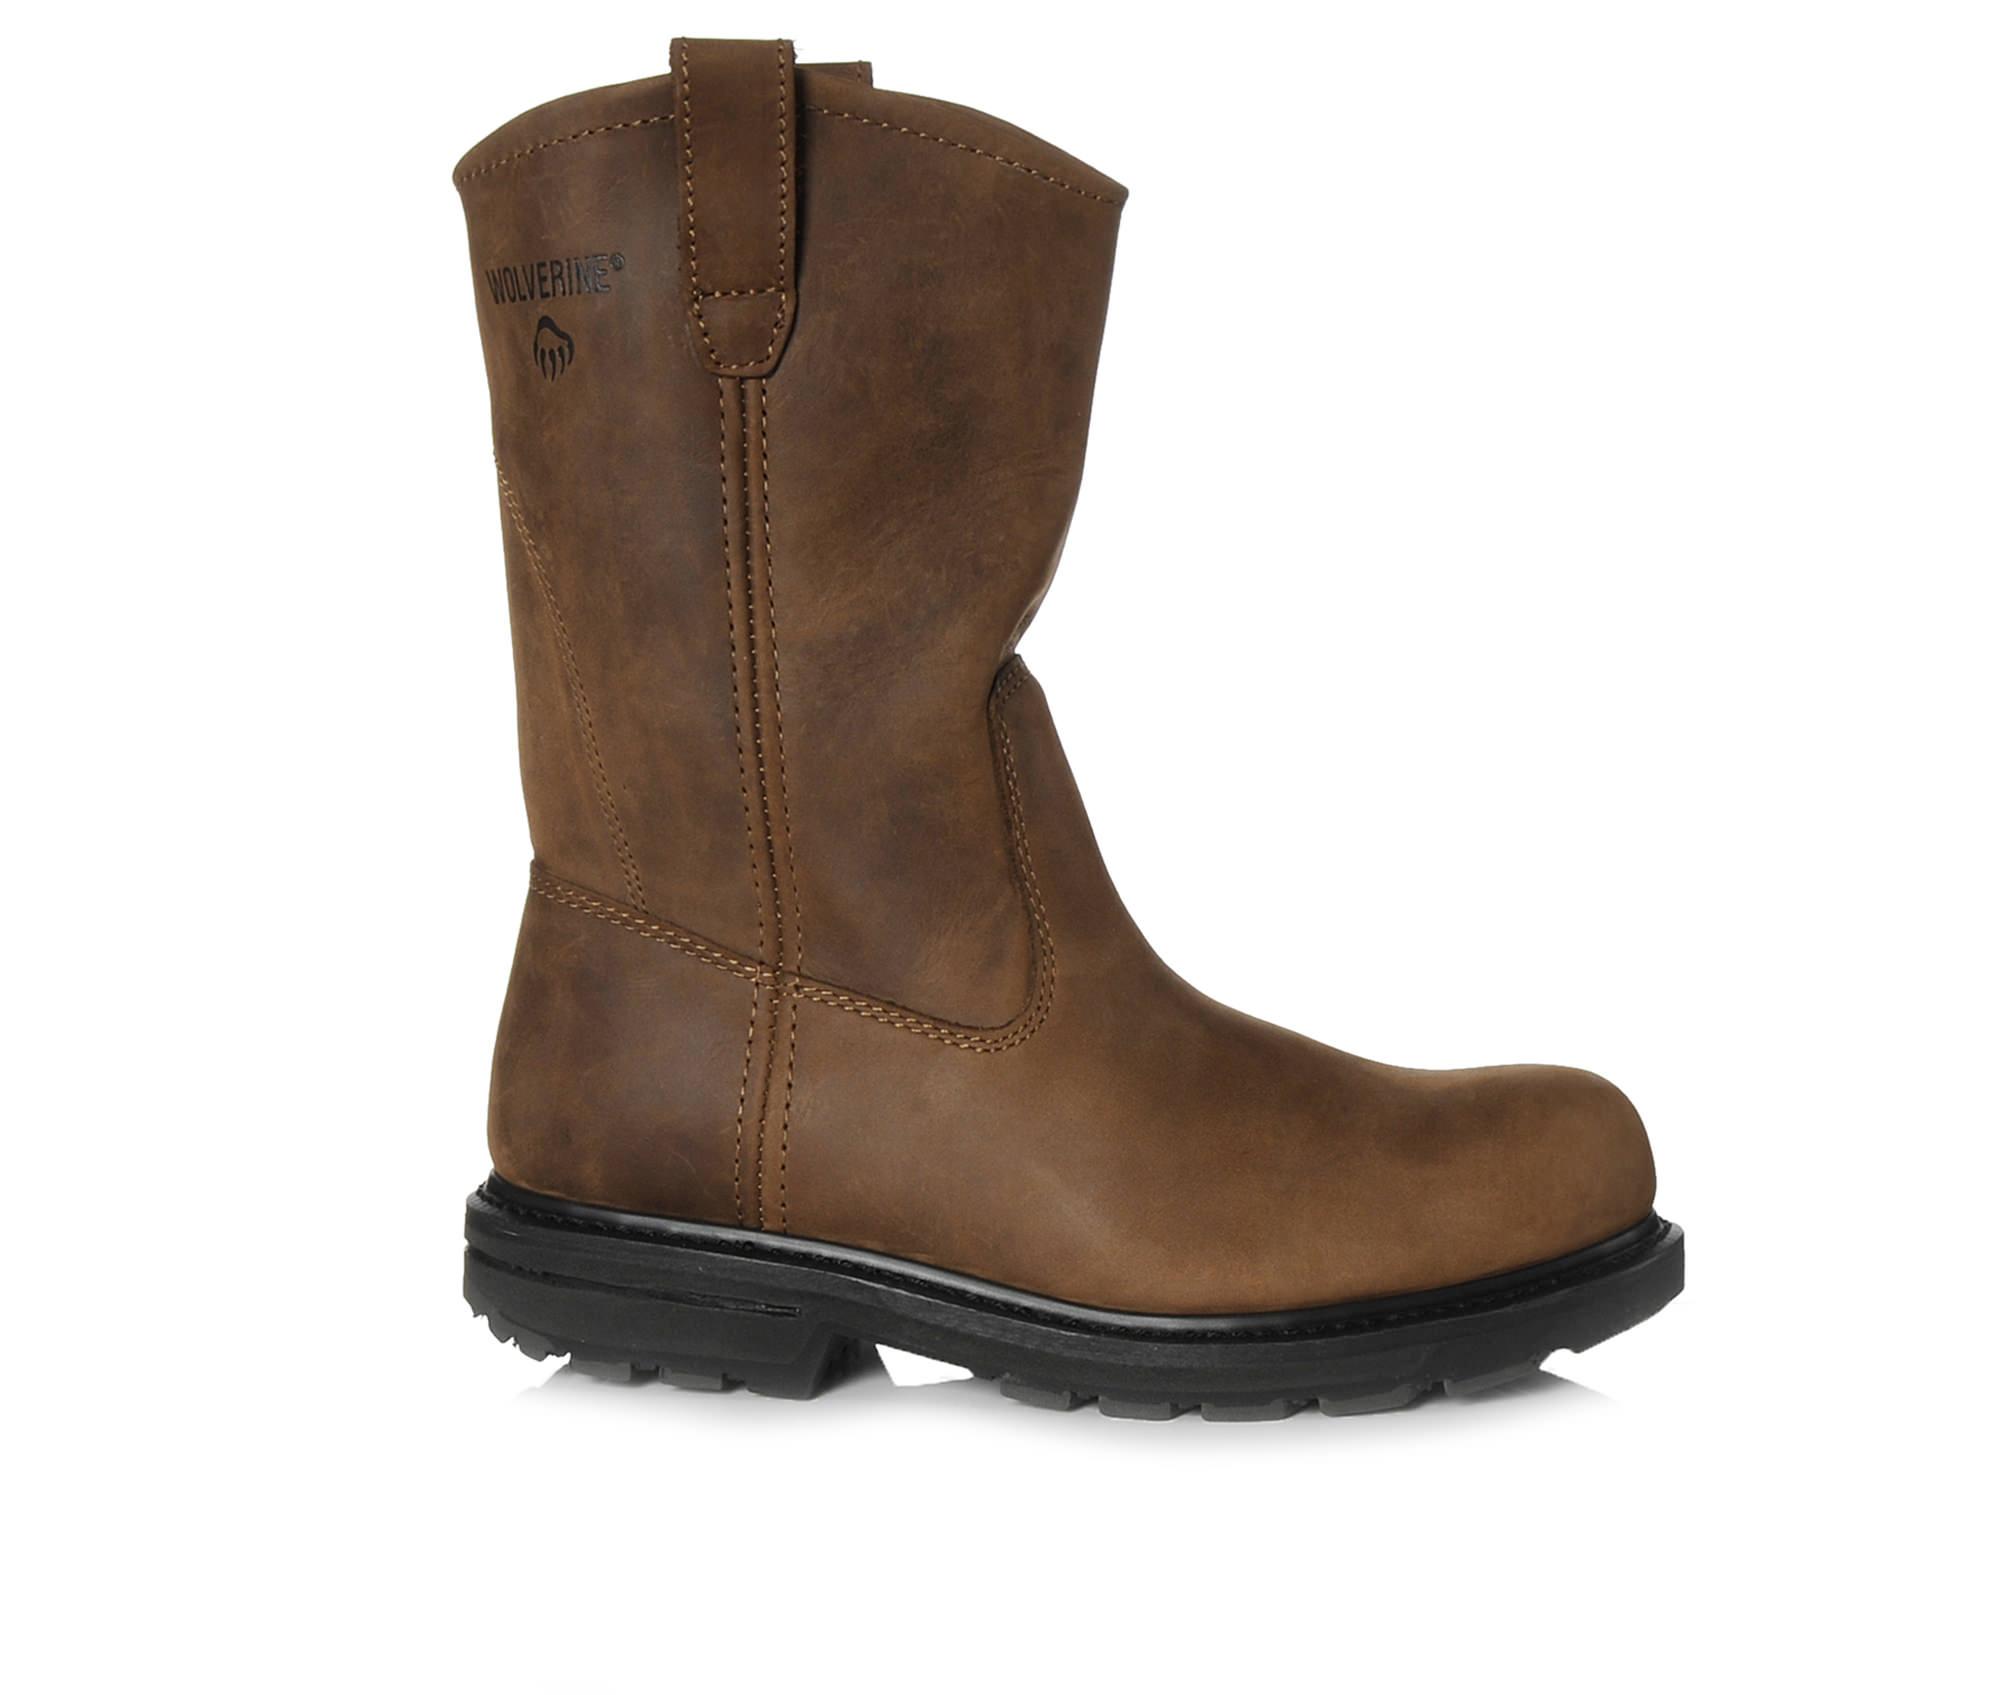 Wolverine Wellington 10 In Steel Toe 4707 Men's Boots (Brown Leather)